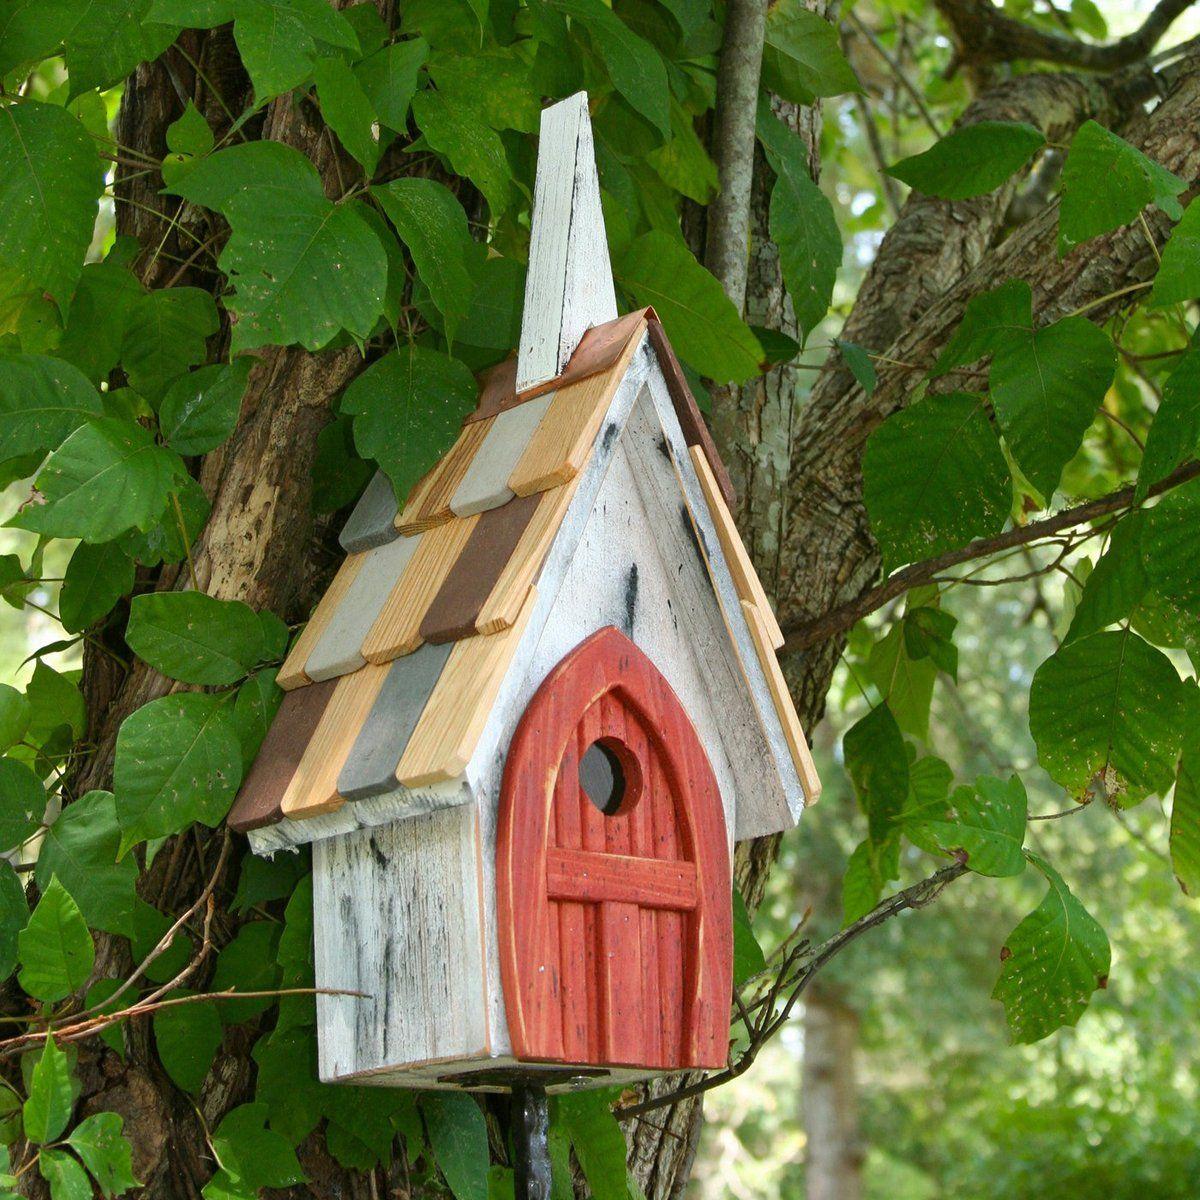 Flock Of Ages Chapel Bird House Yard Envy Bird Houses Decorative Bird Houses Bird House Kits